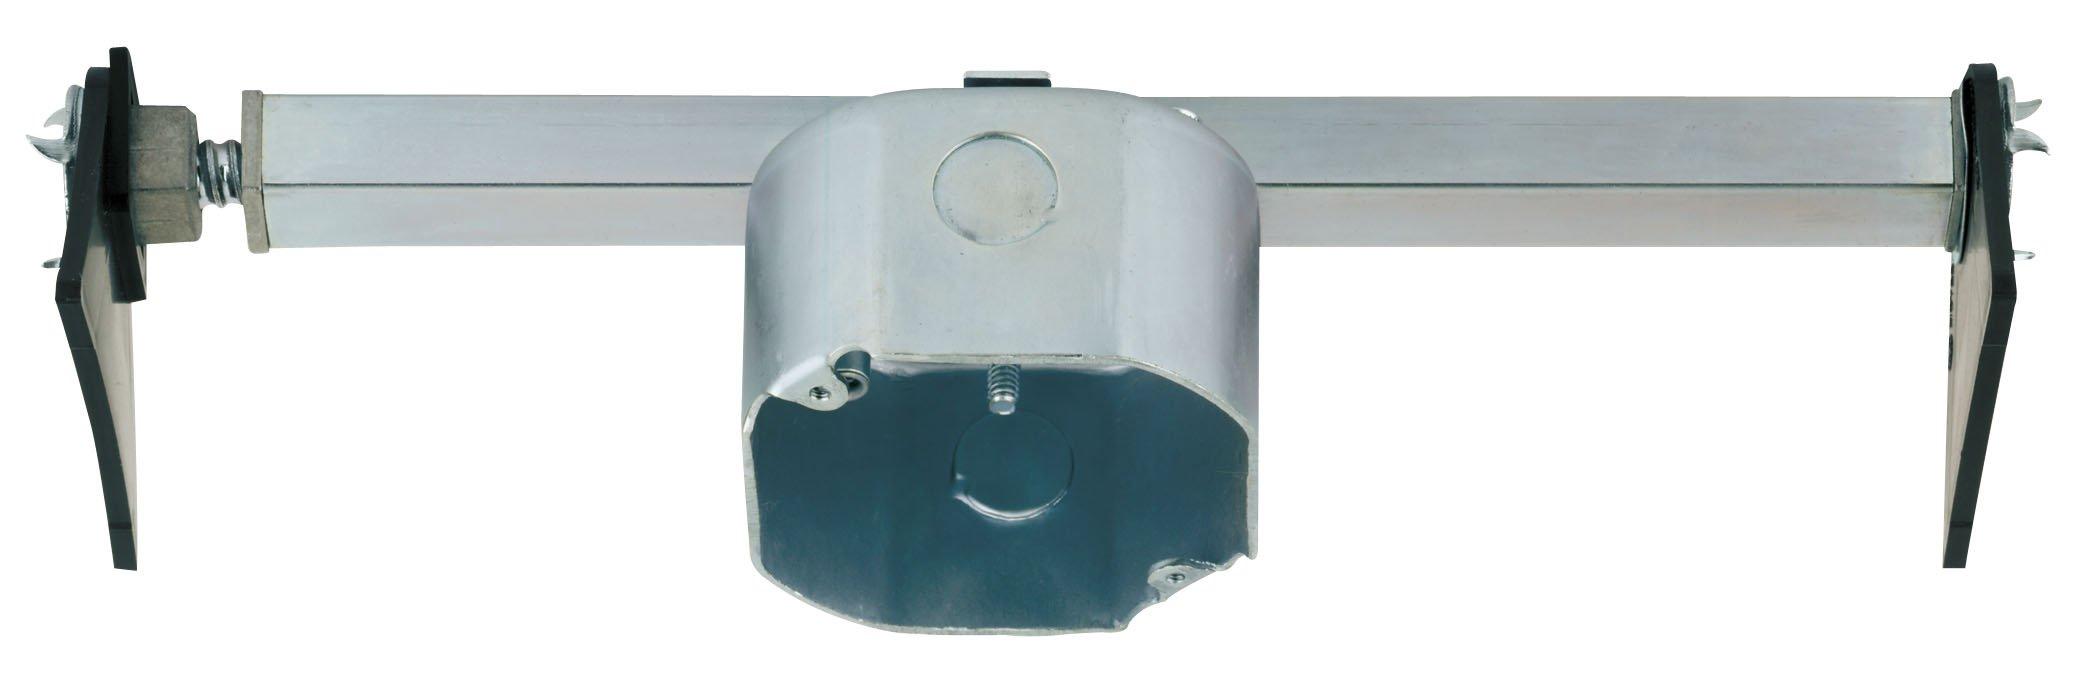 Westinghouse Lighting 140000 0140000 Saf-T-Brace for Ceiling Fans, Metalic